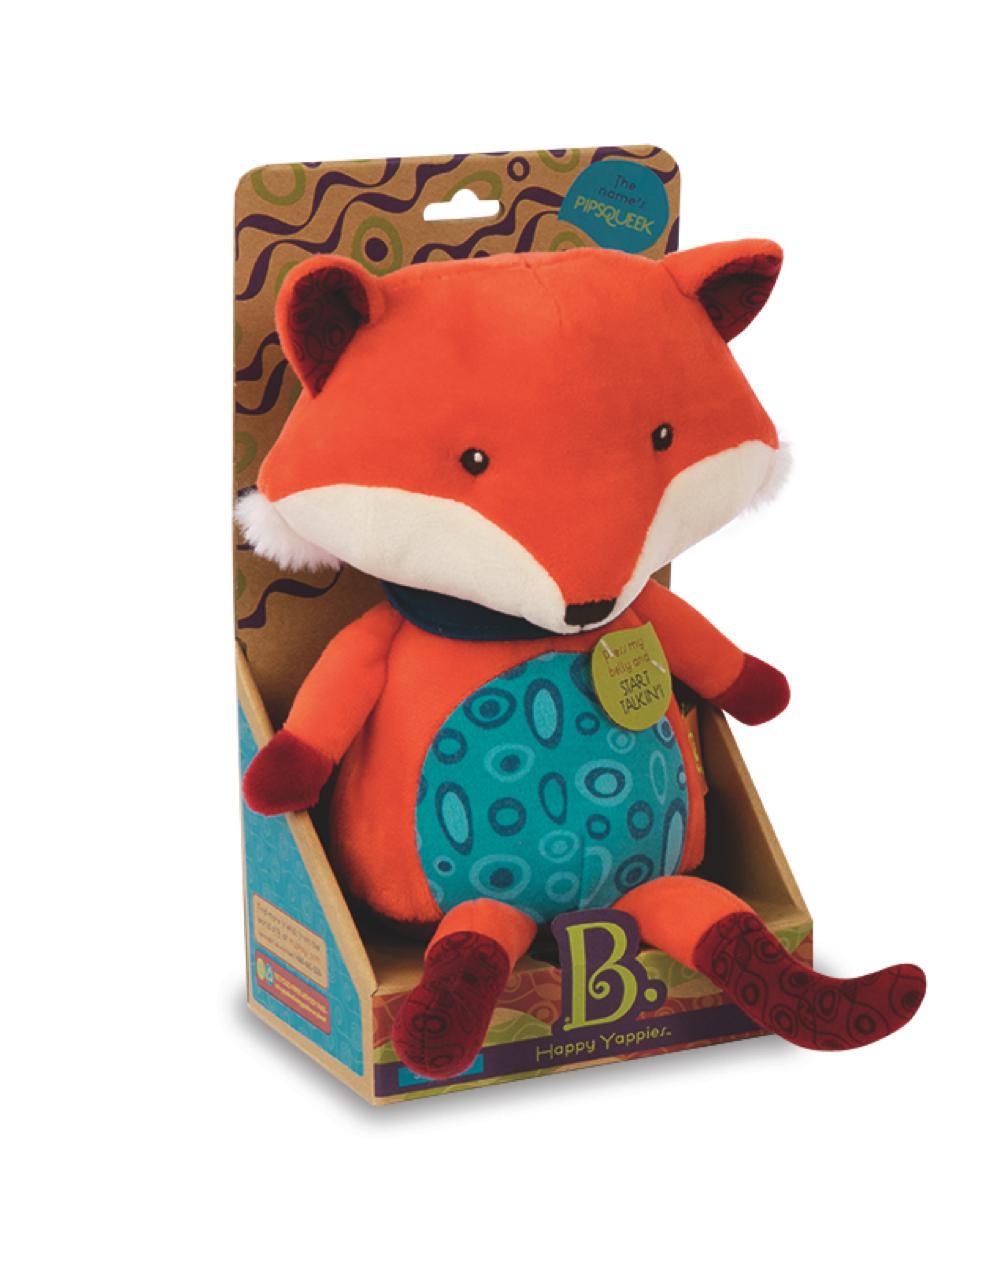 Happy Yappies Pipsqueak the Fox